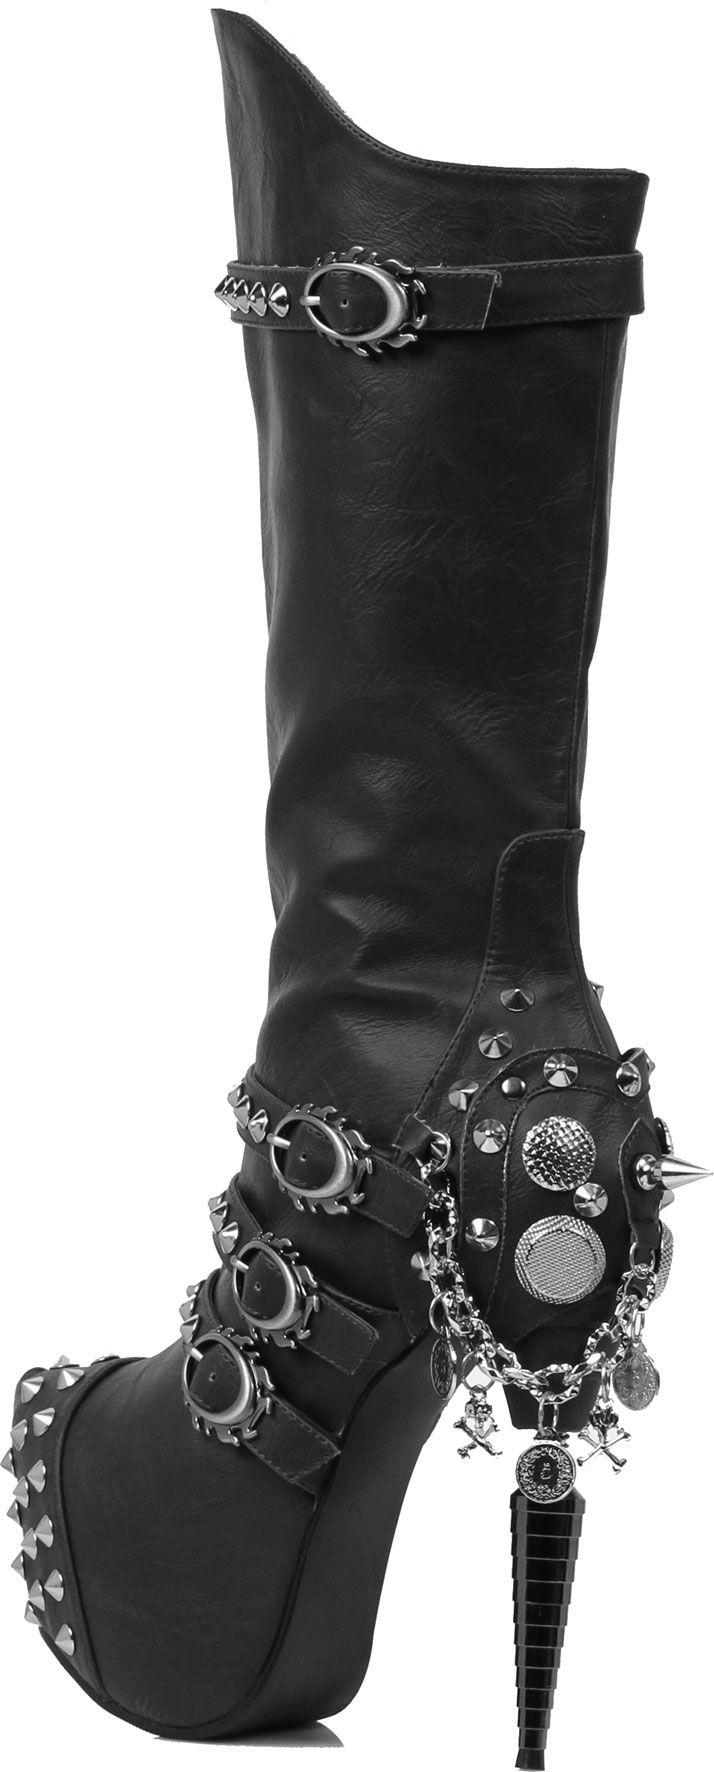 Hades Valda Boots! #hades #valda #steampunk